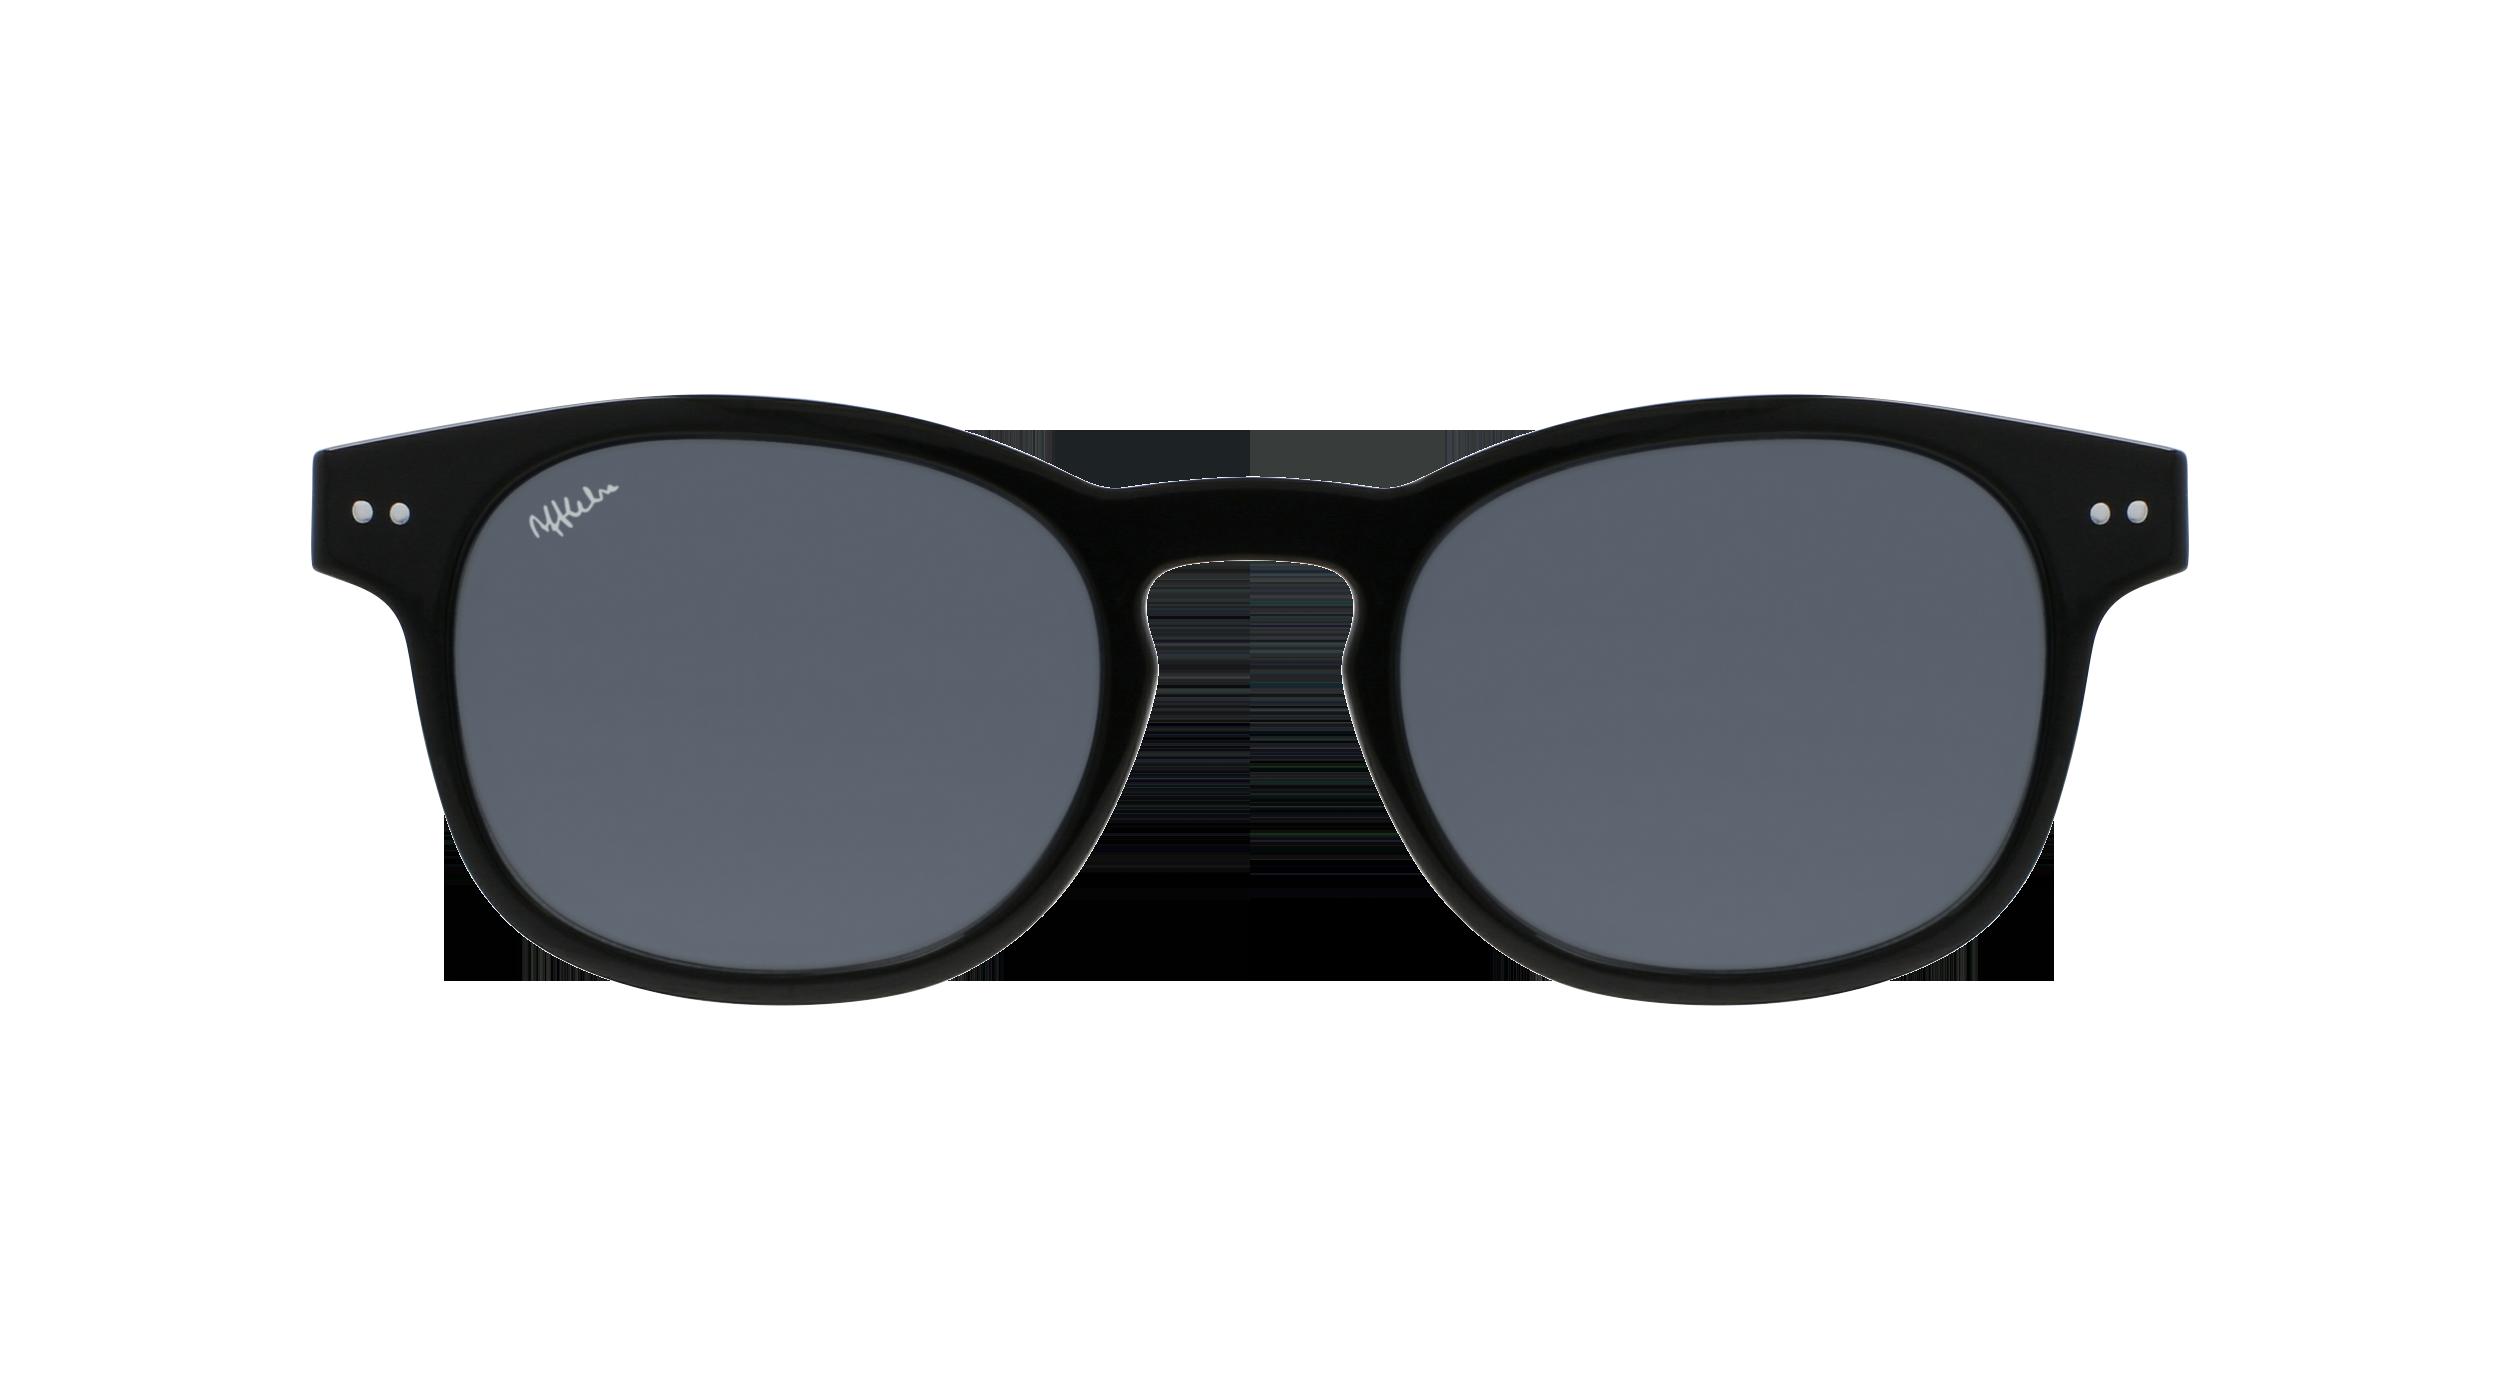 afflelou/france/products/smart_clip/clips_glasses/07630036452929.png